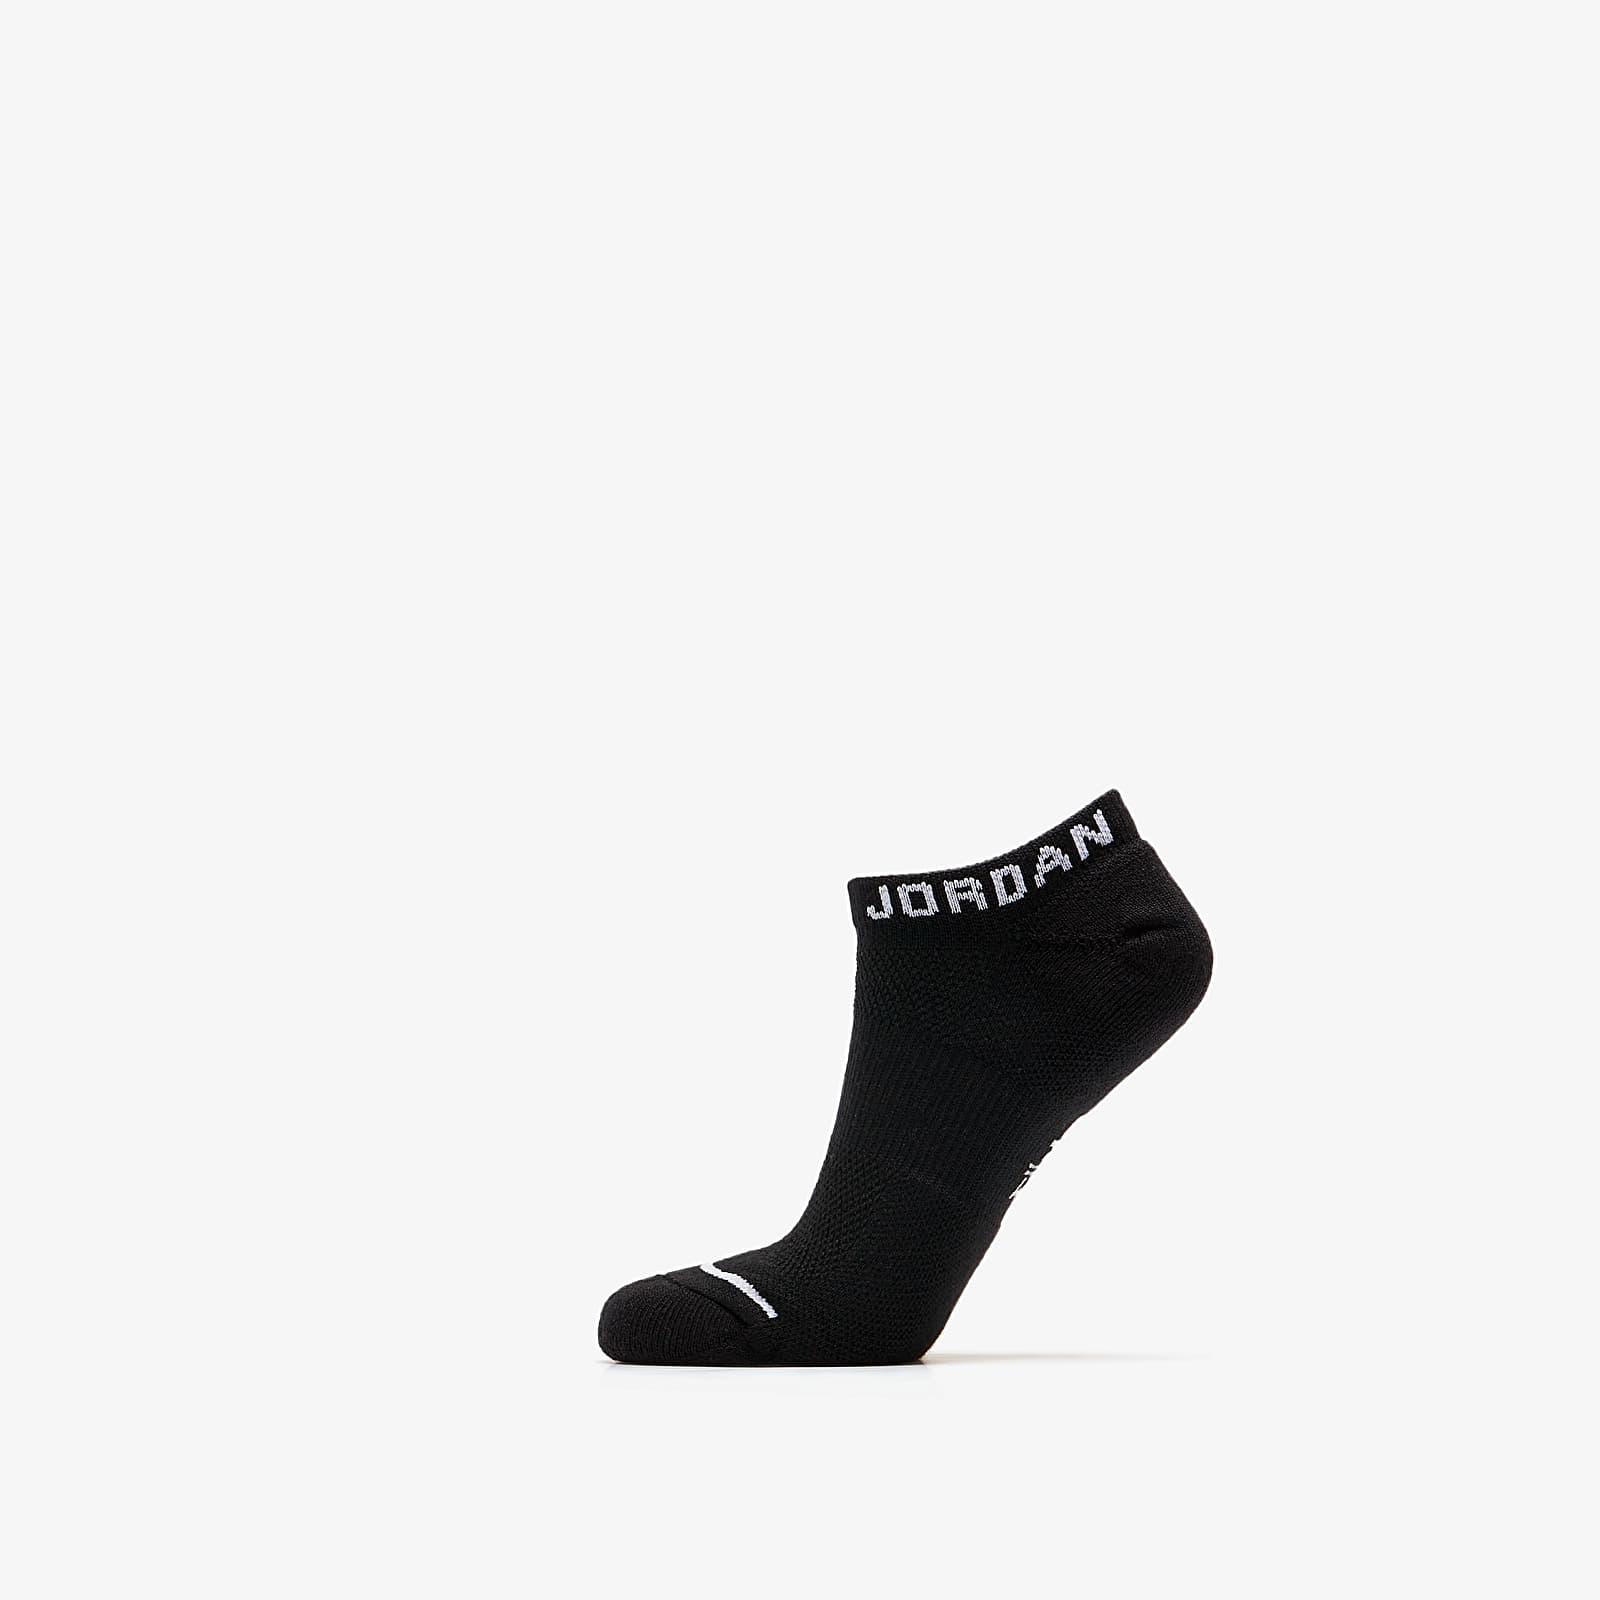 Jordan Everyday Max NS 3 Pair Socks